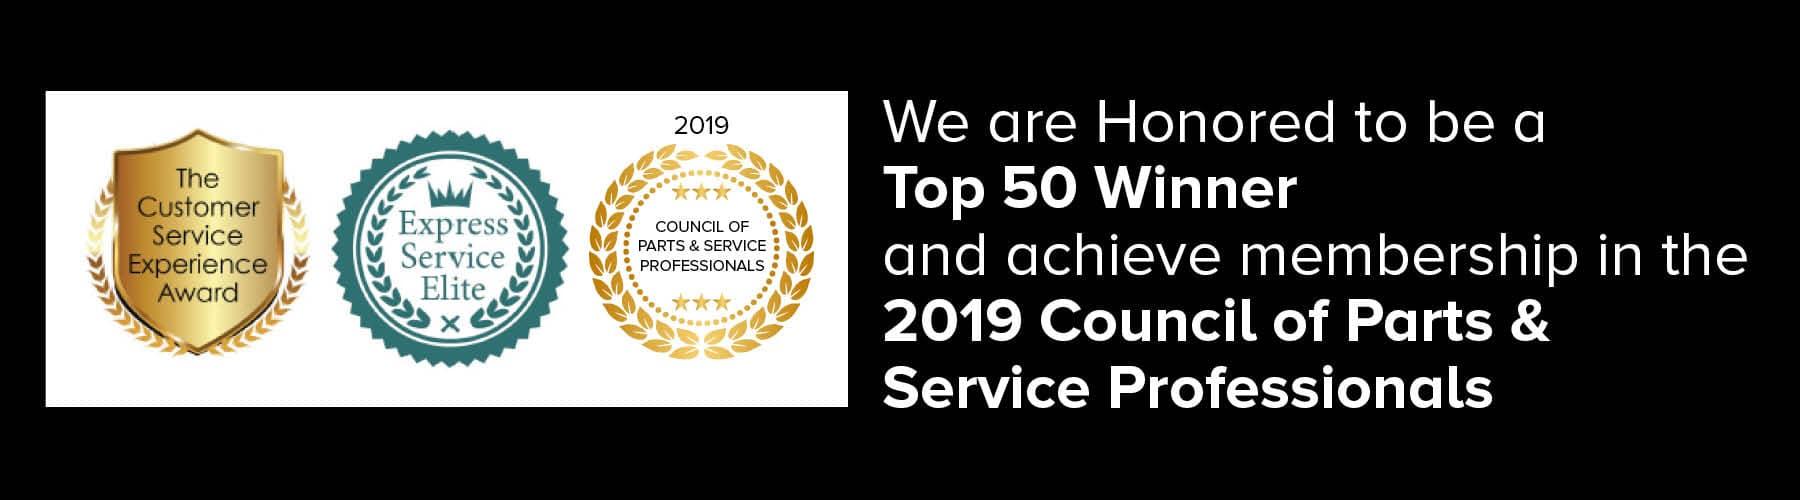 MetHon-1100 service award website banner